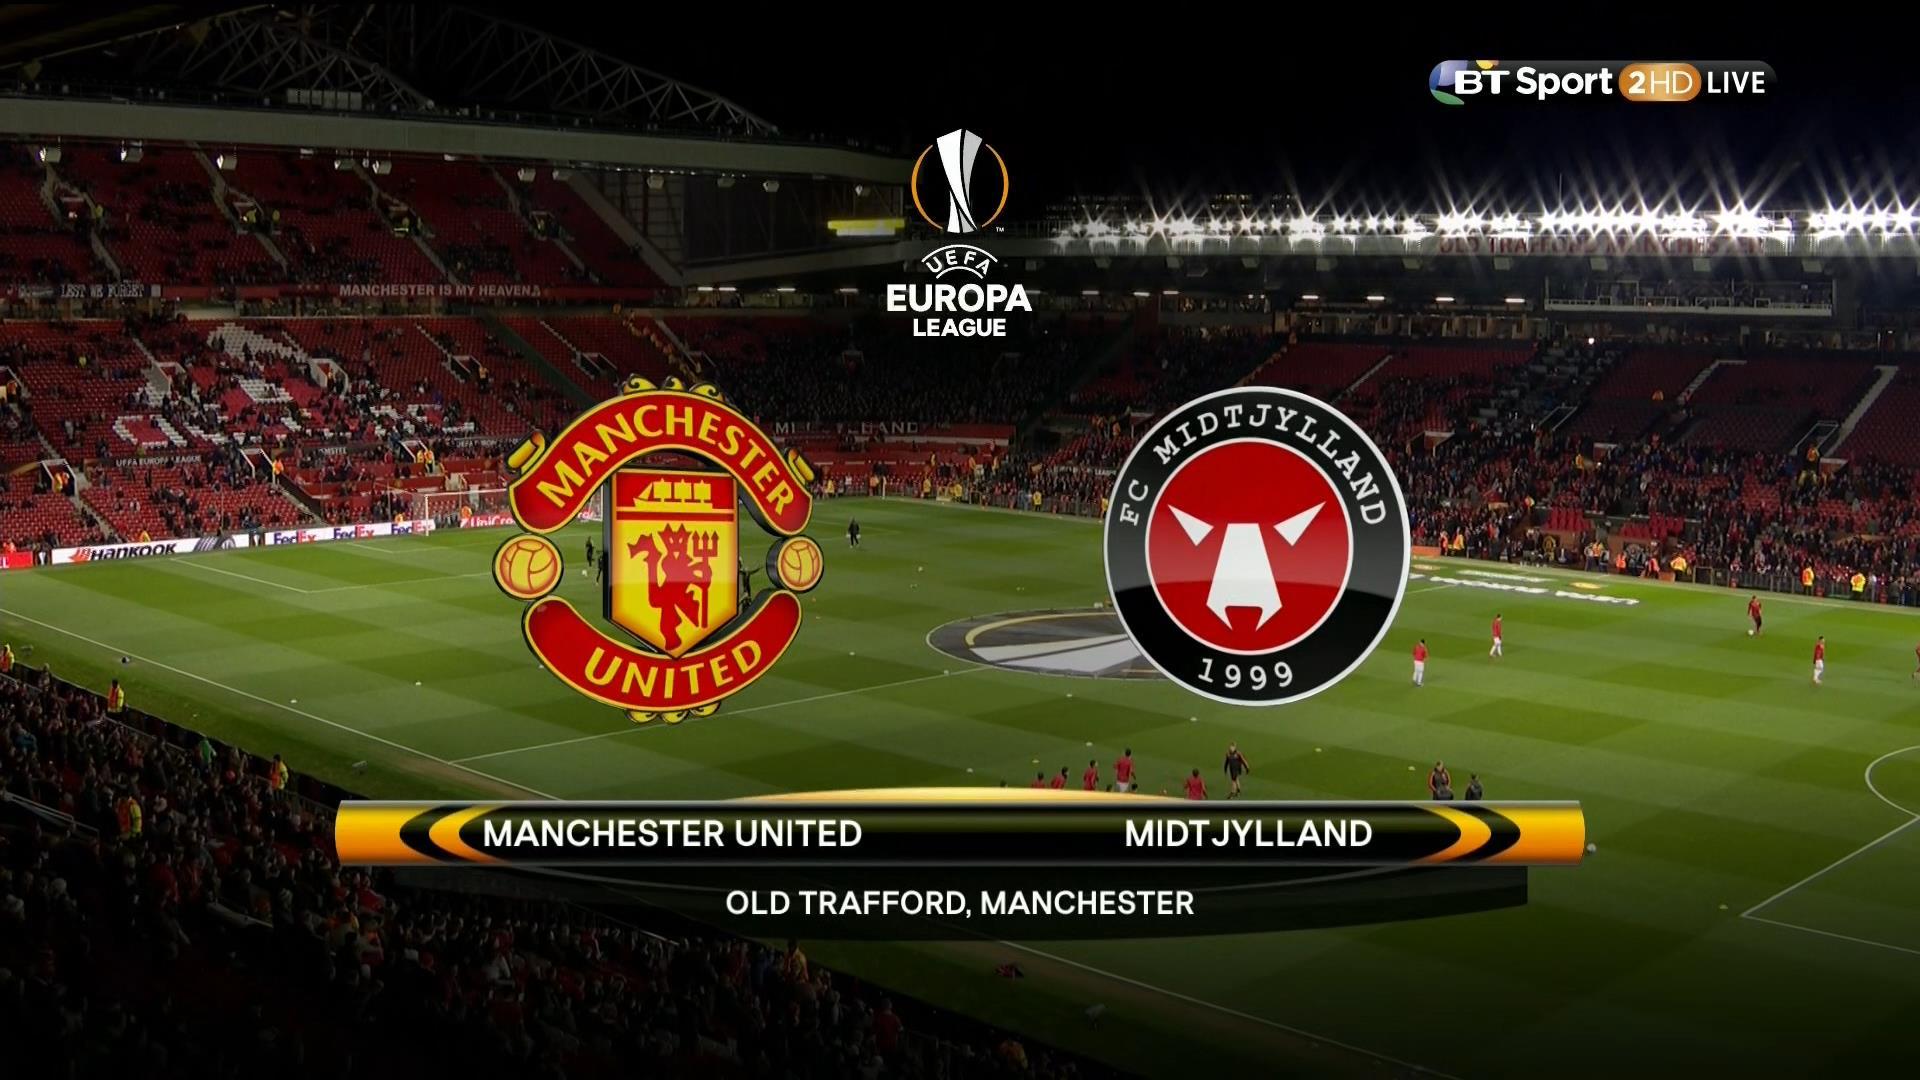 Xem lại: Manchester United vs Midtjylland